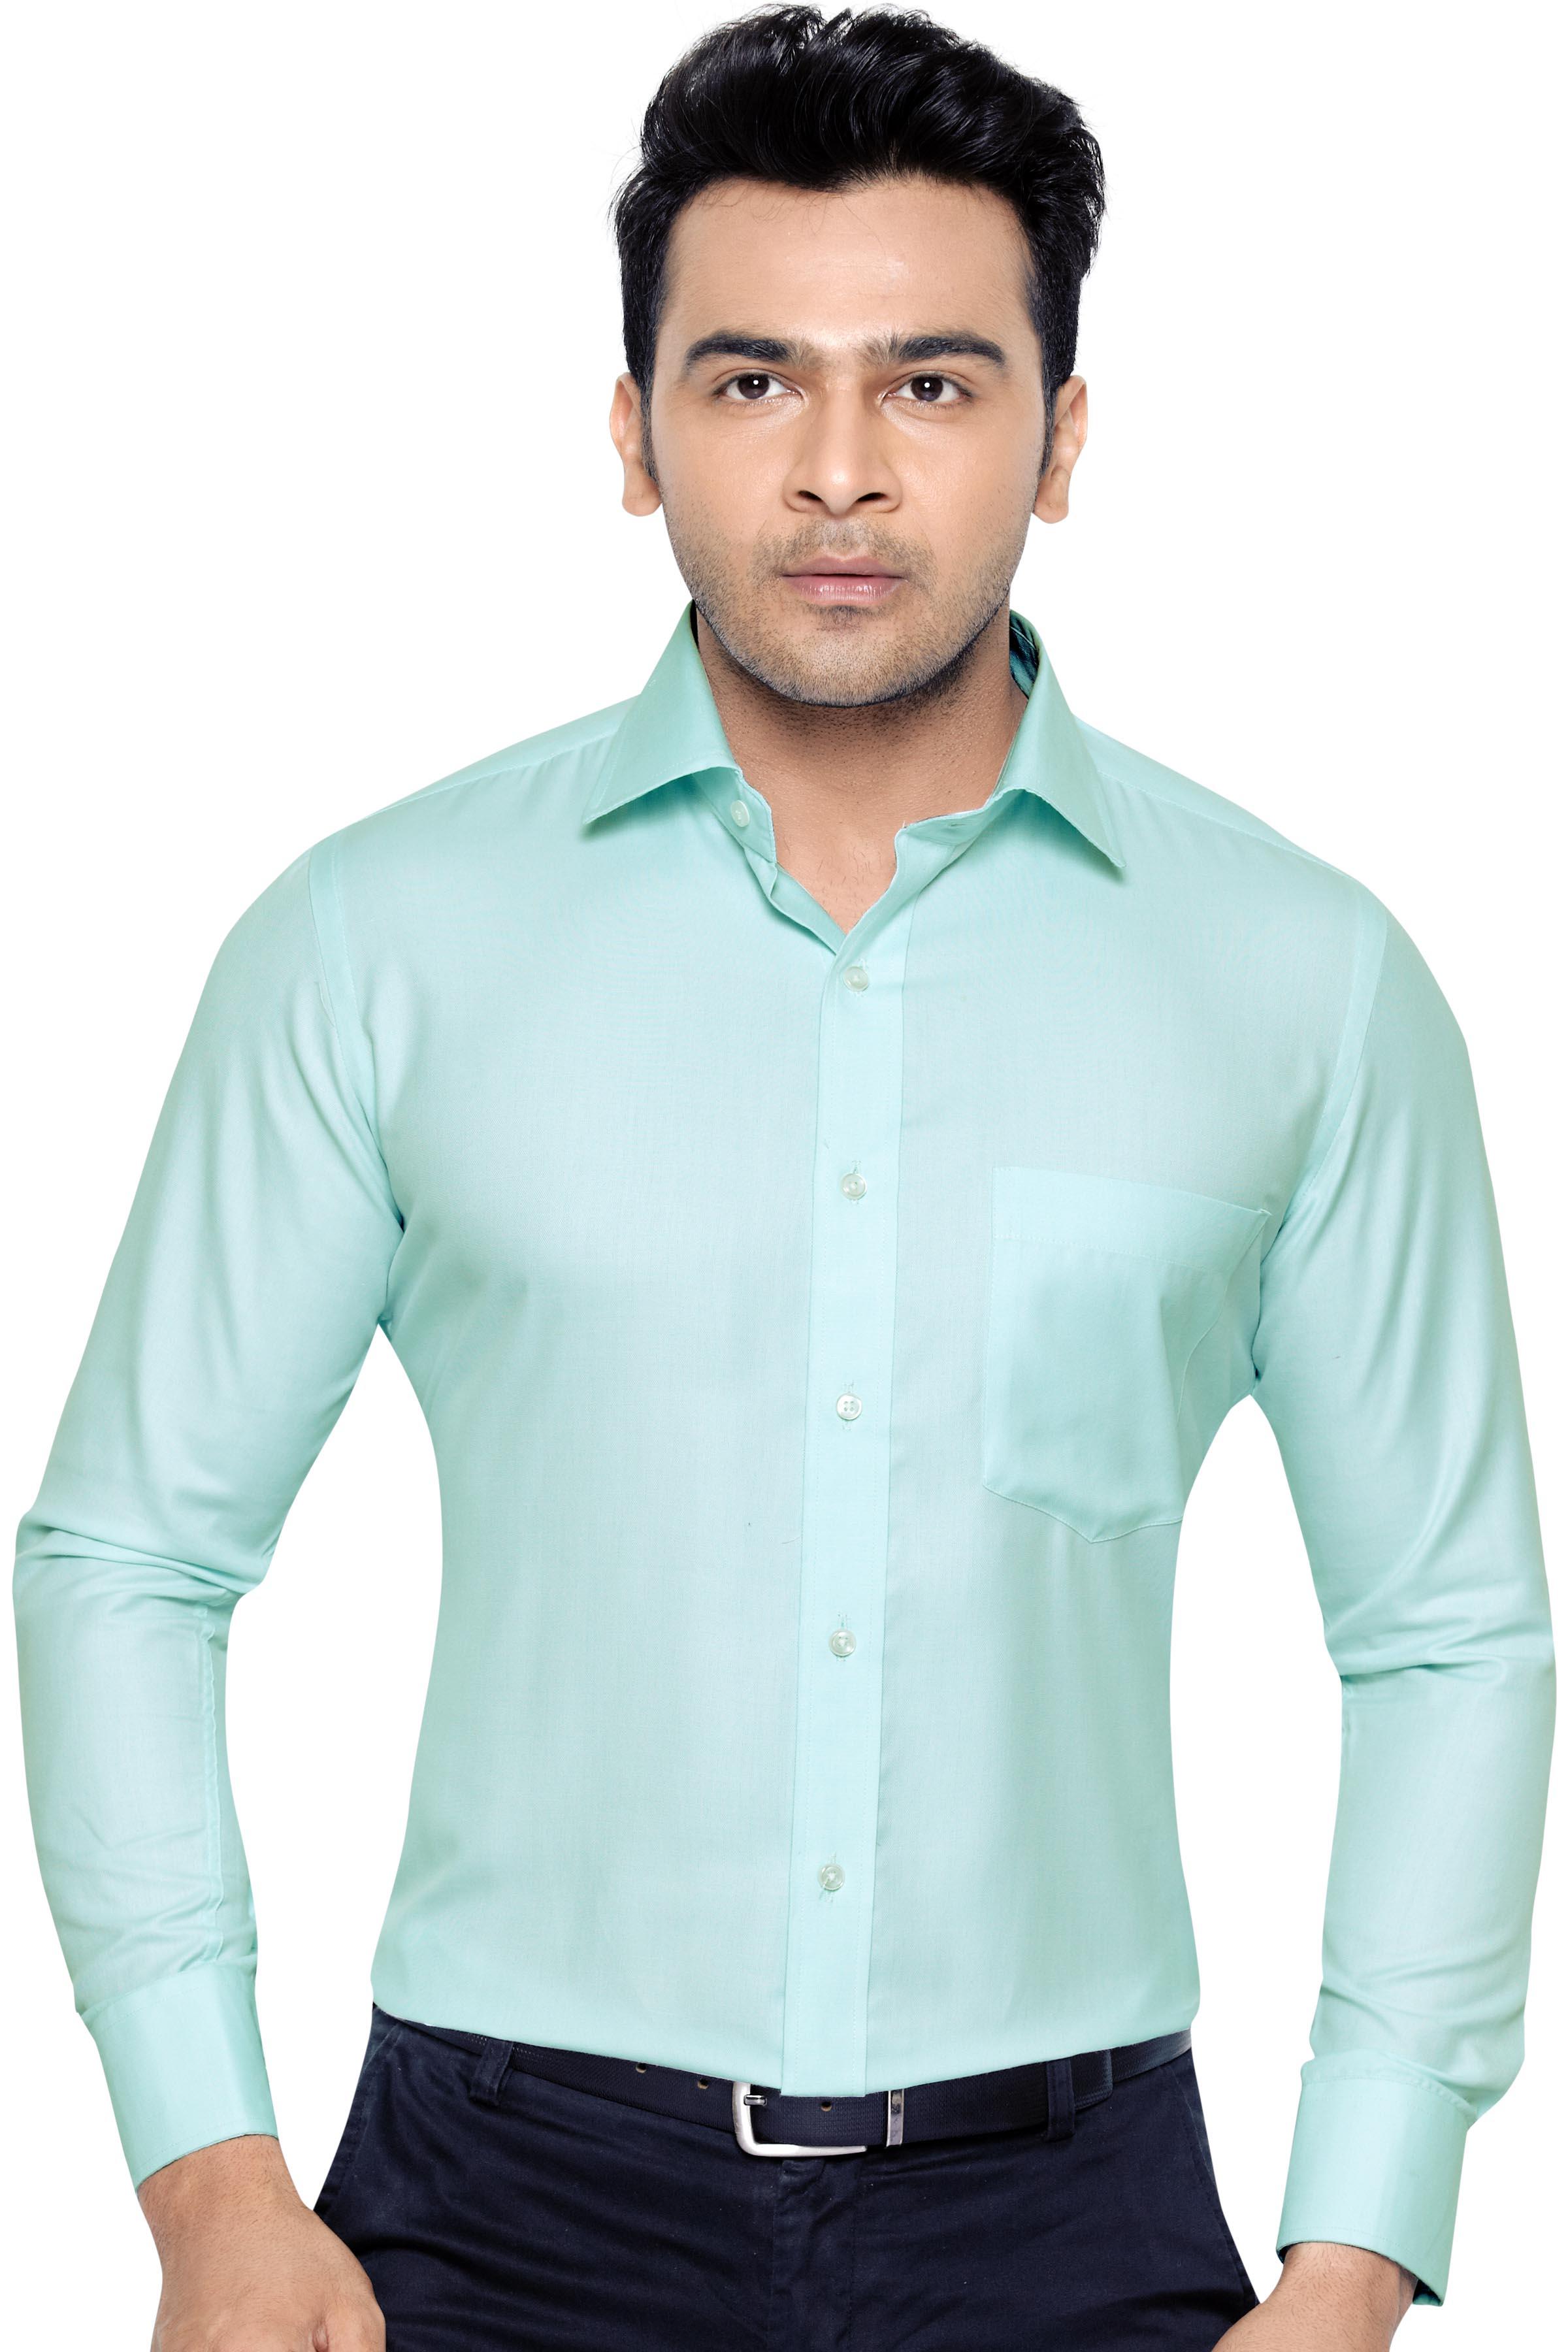 Corporate Club Beetel Mens Formal Office Wear Shirt Green  M